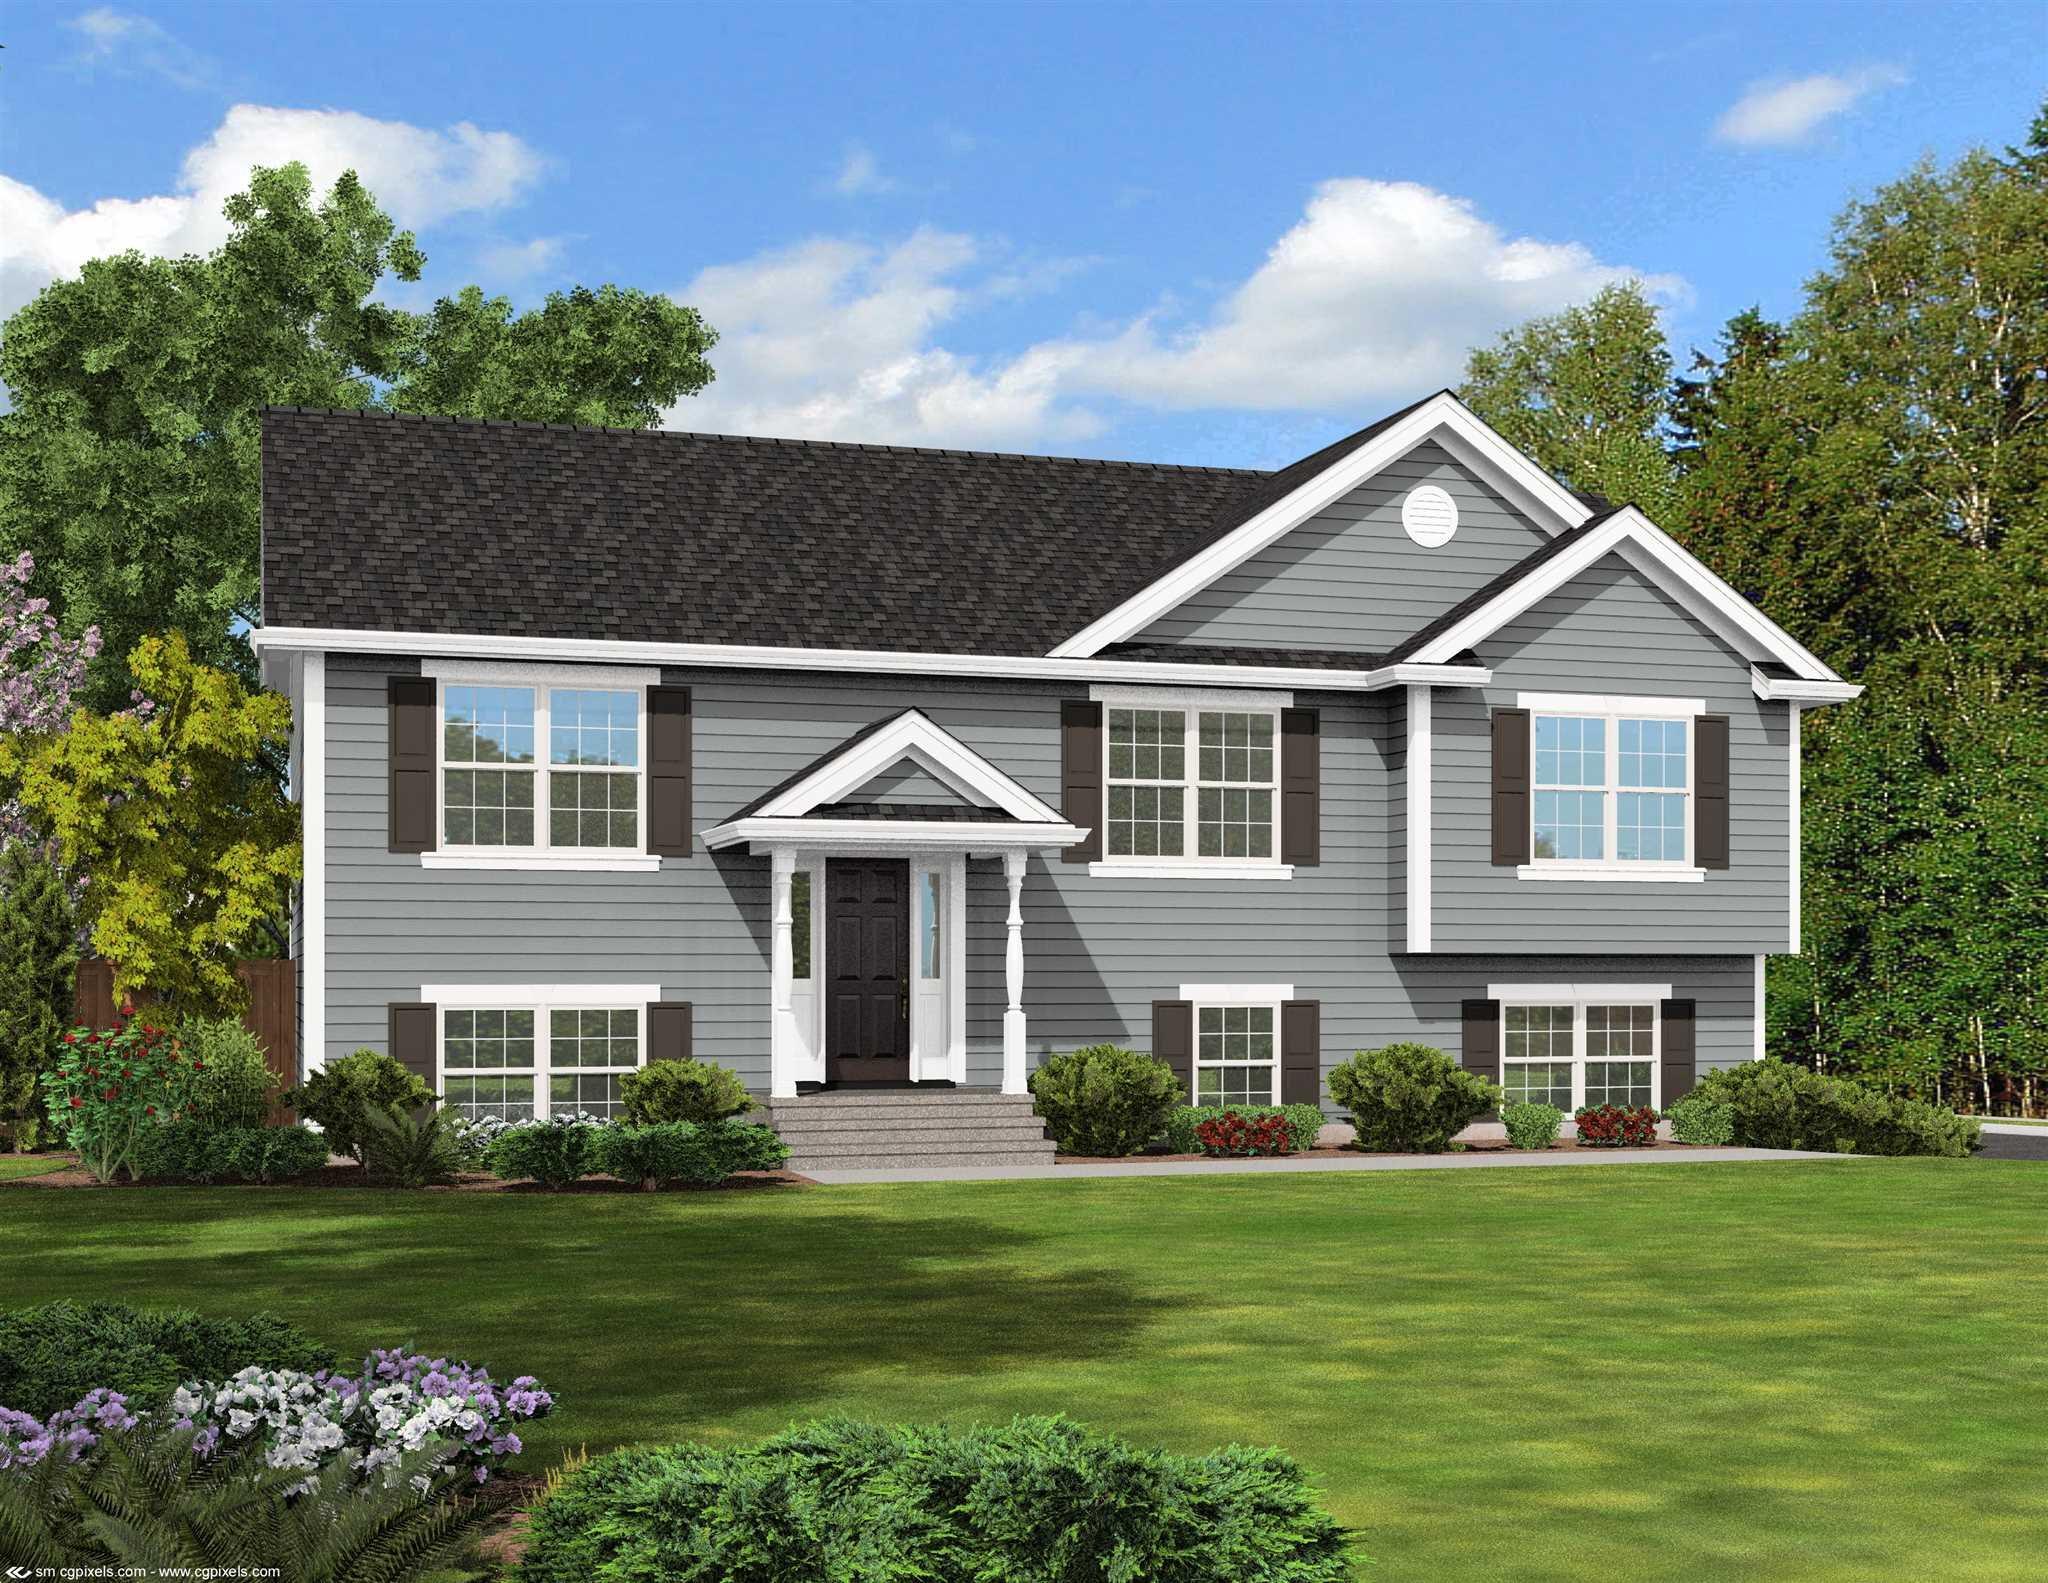 Single Family Home for Sale at 435 MILTON TURNPIKE 435 MILTON TURNPIKE Marlboro, New York 12547 United States